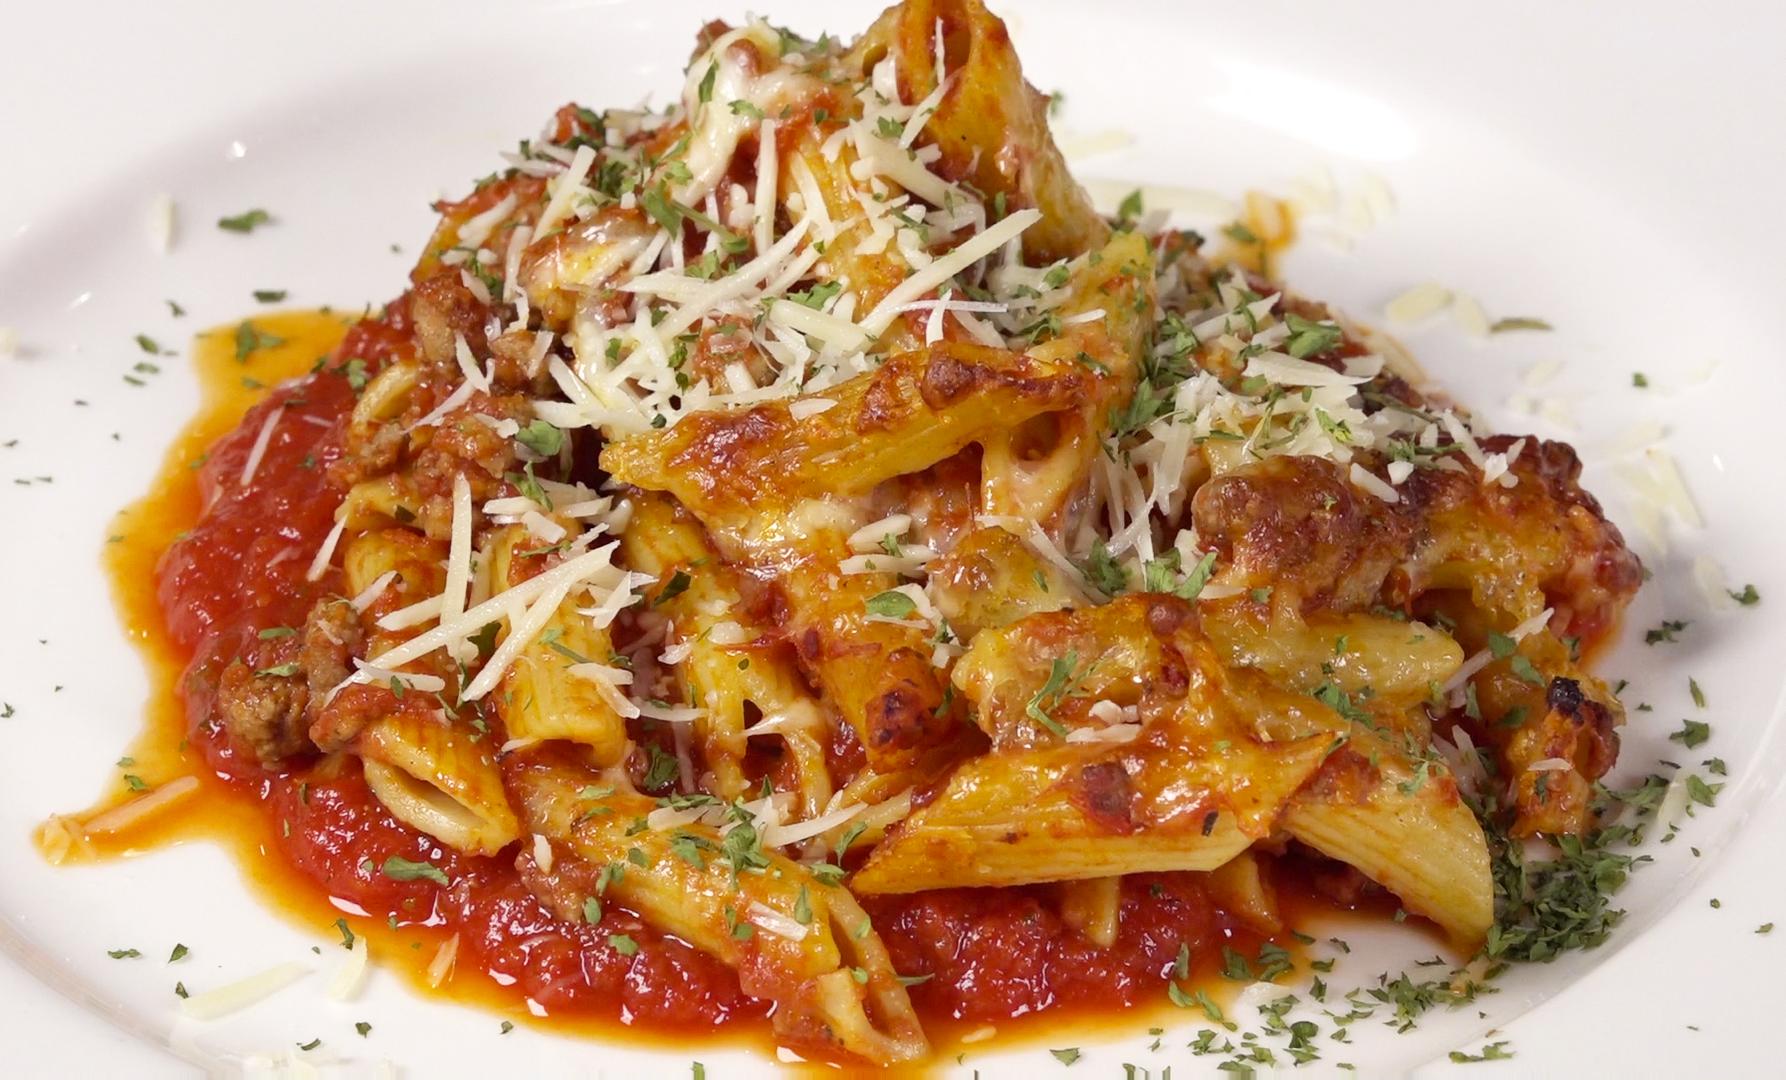 nicholas's-cheesy-baked-penne-pasta2.jpg